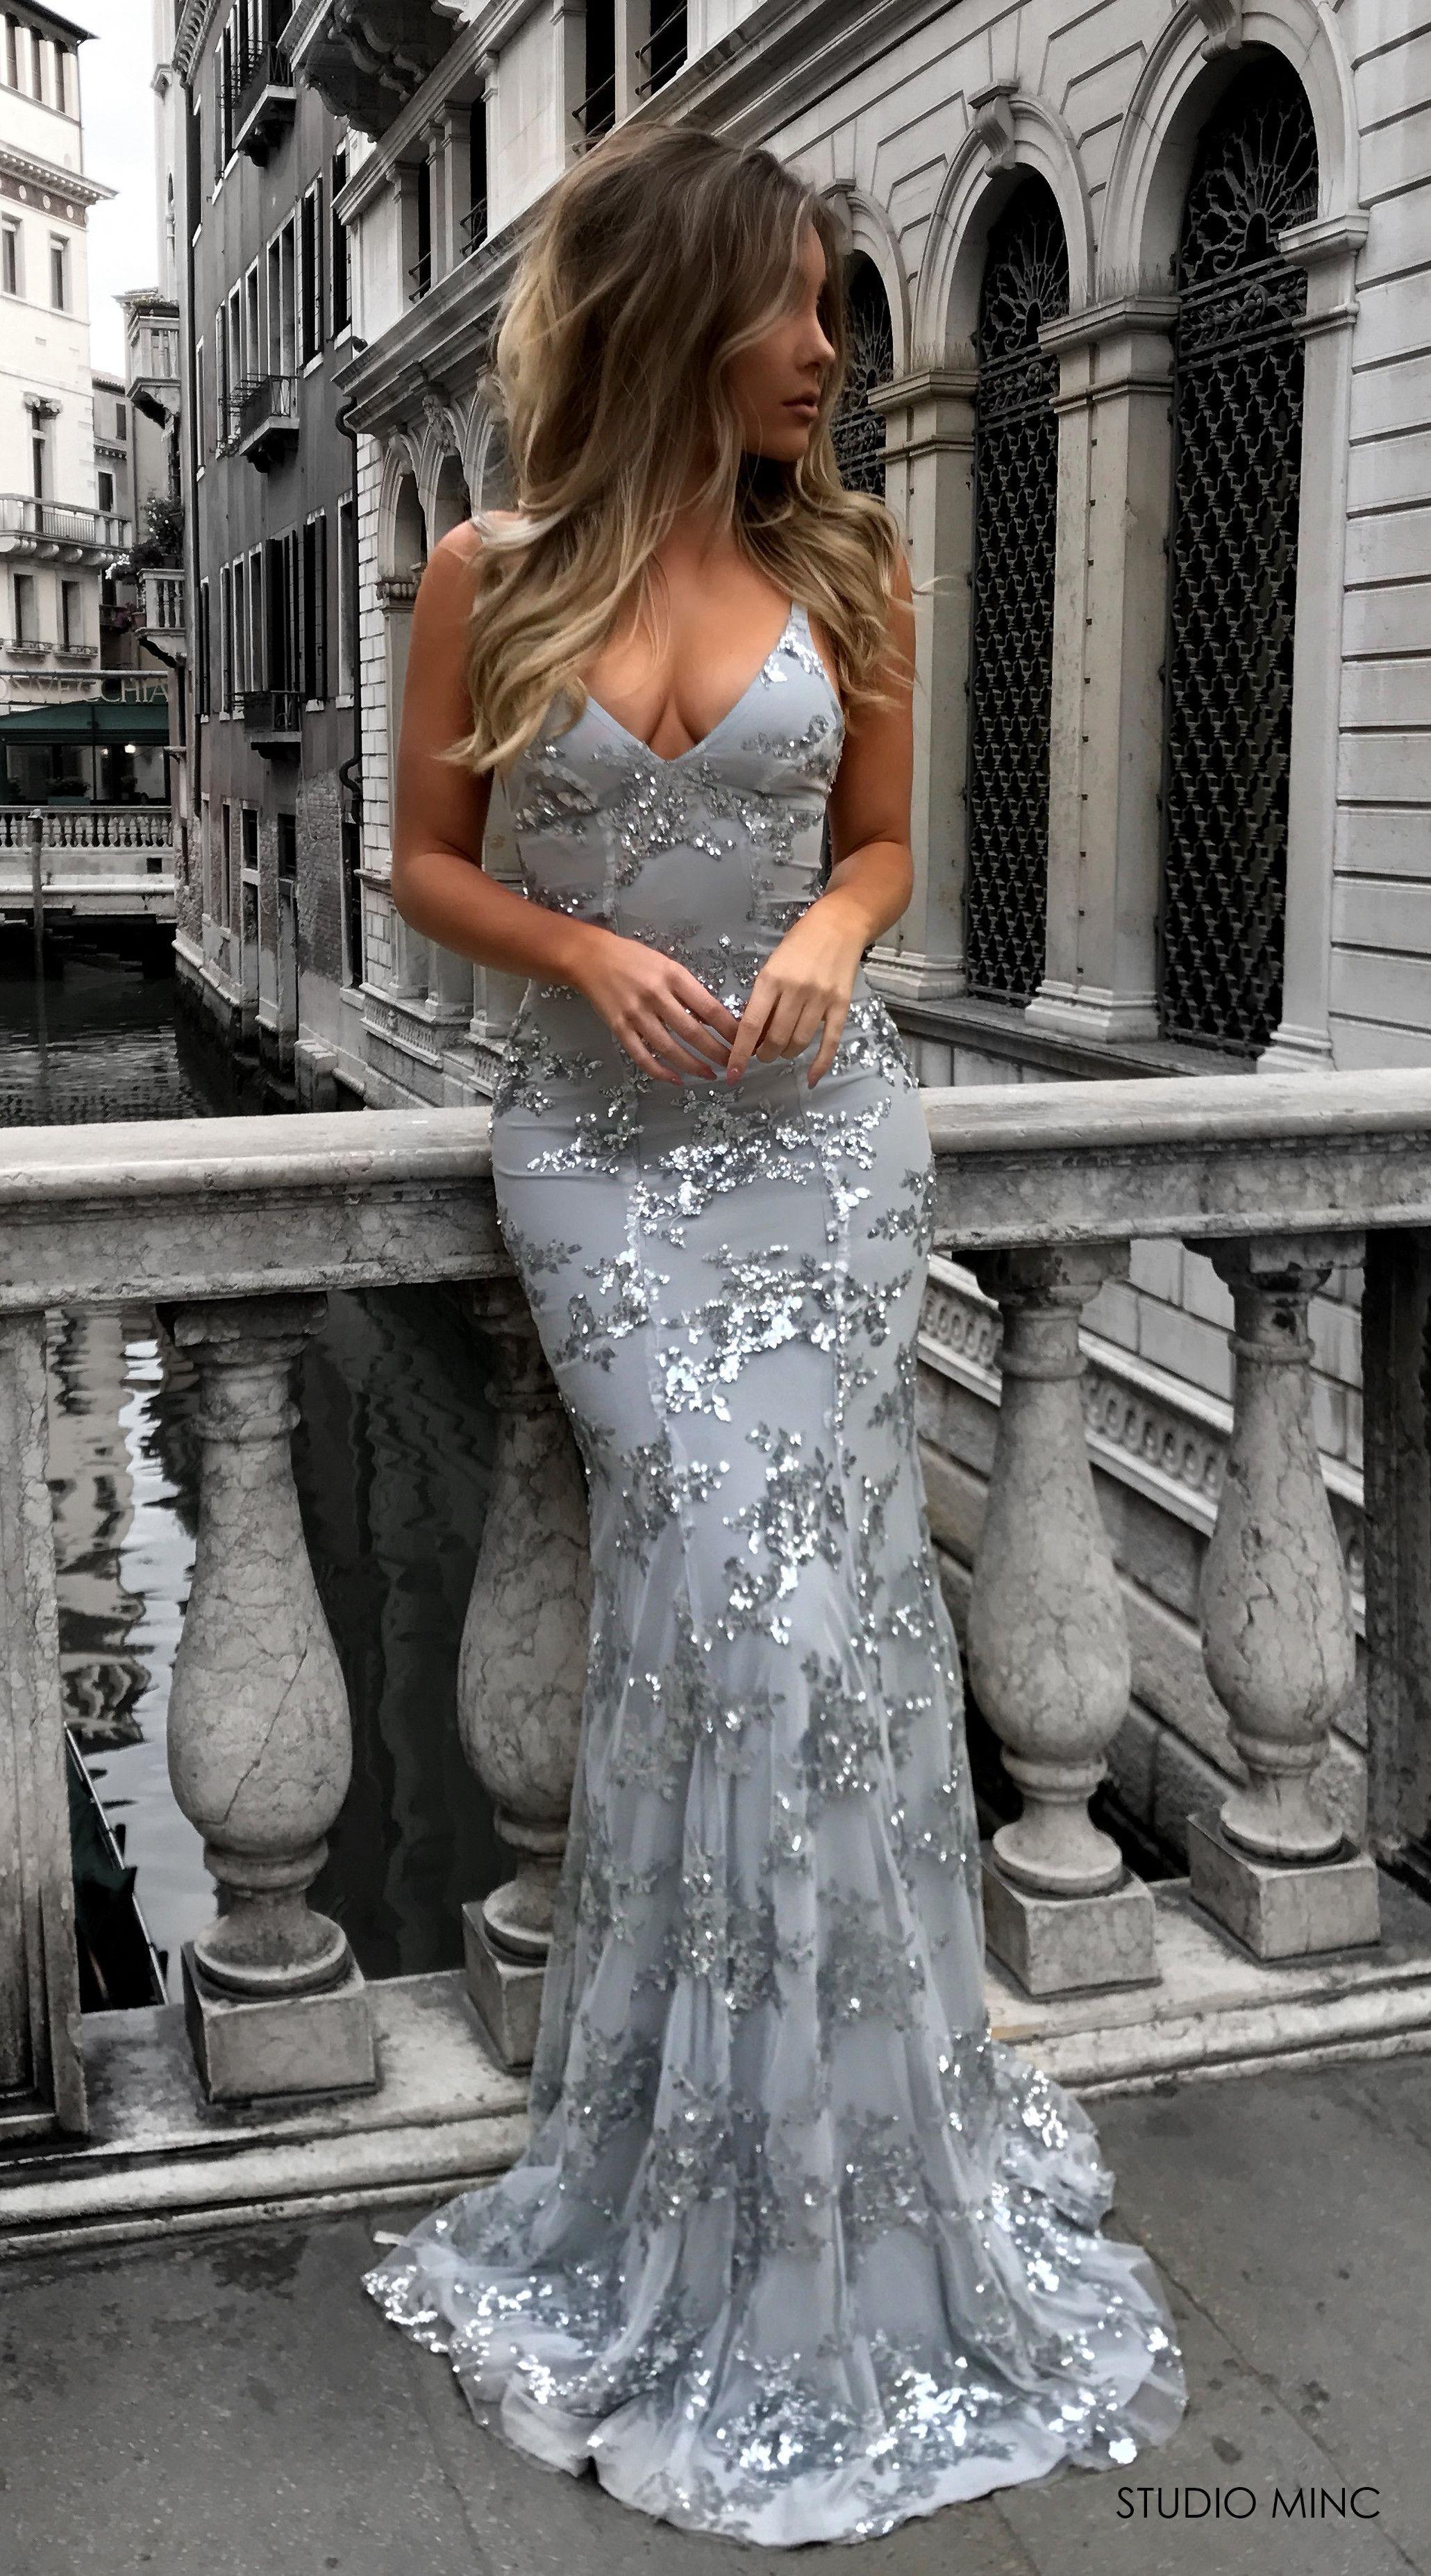 Silver jadore luxury lifestyle pinterest prom dresses dresses